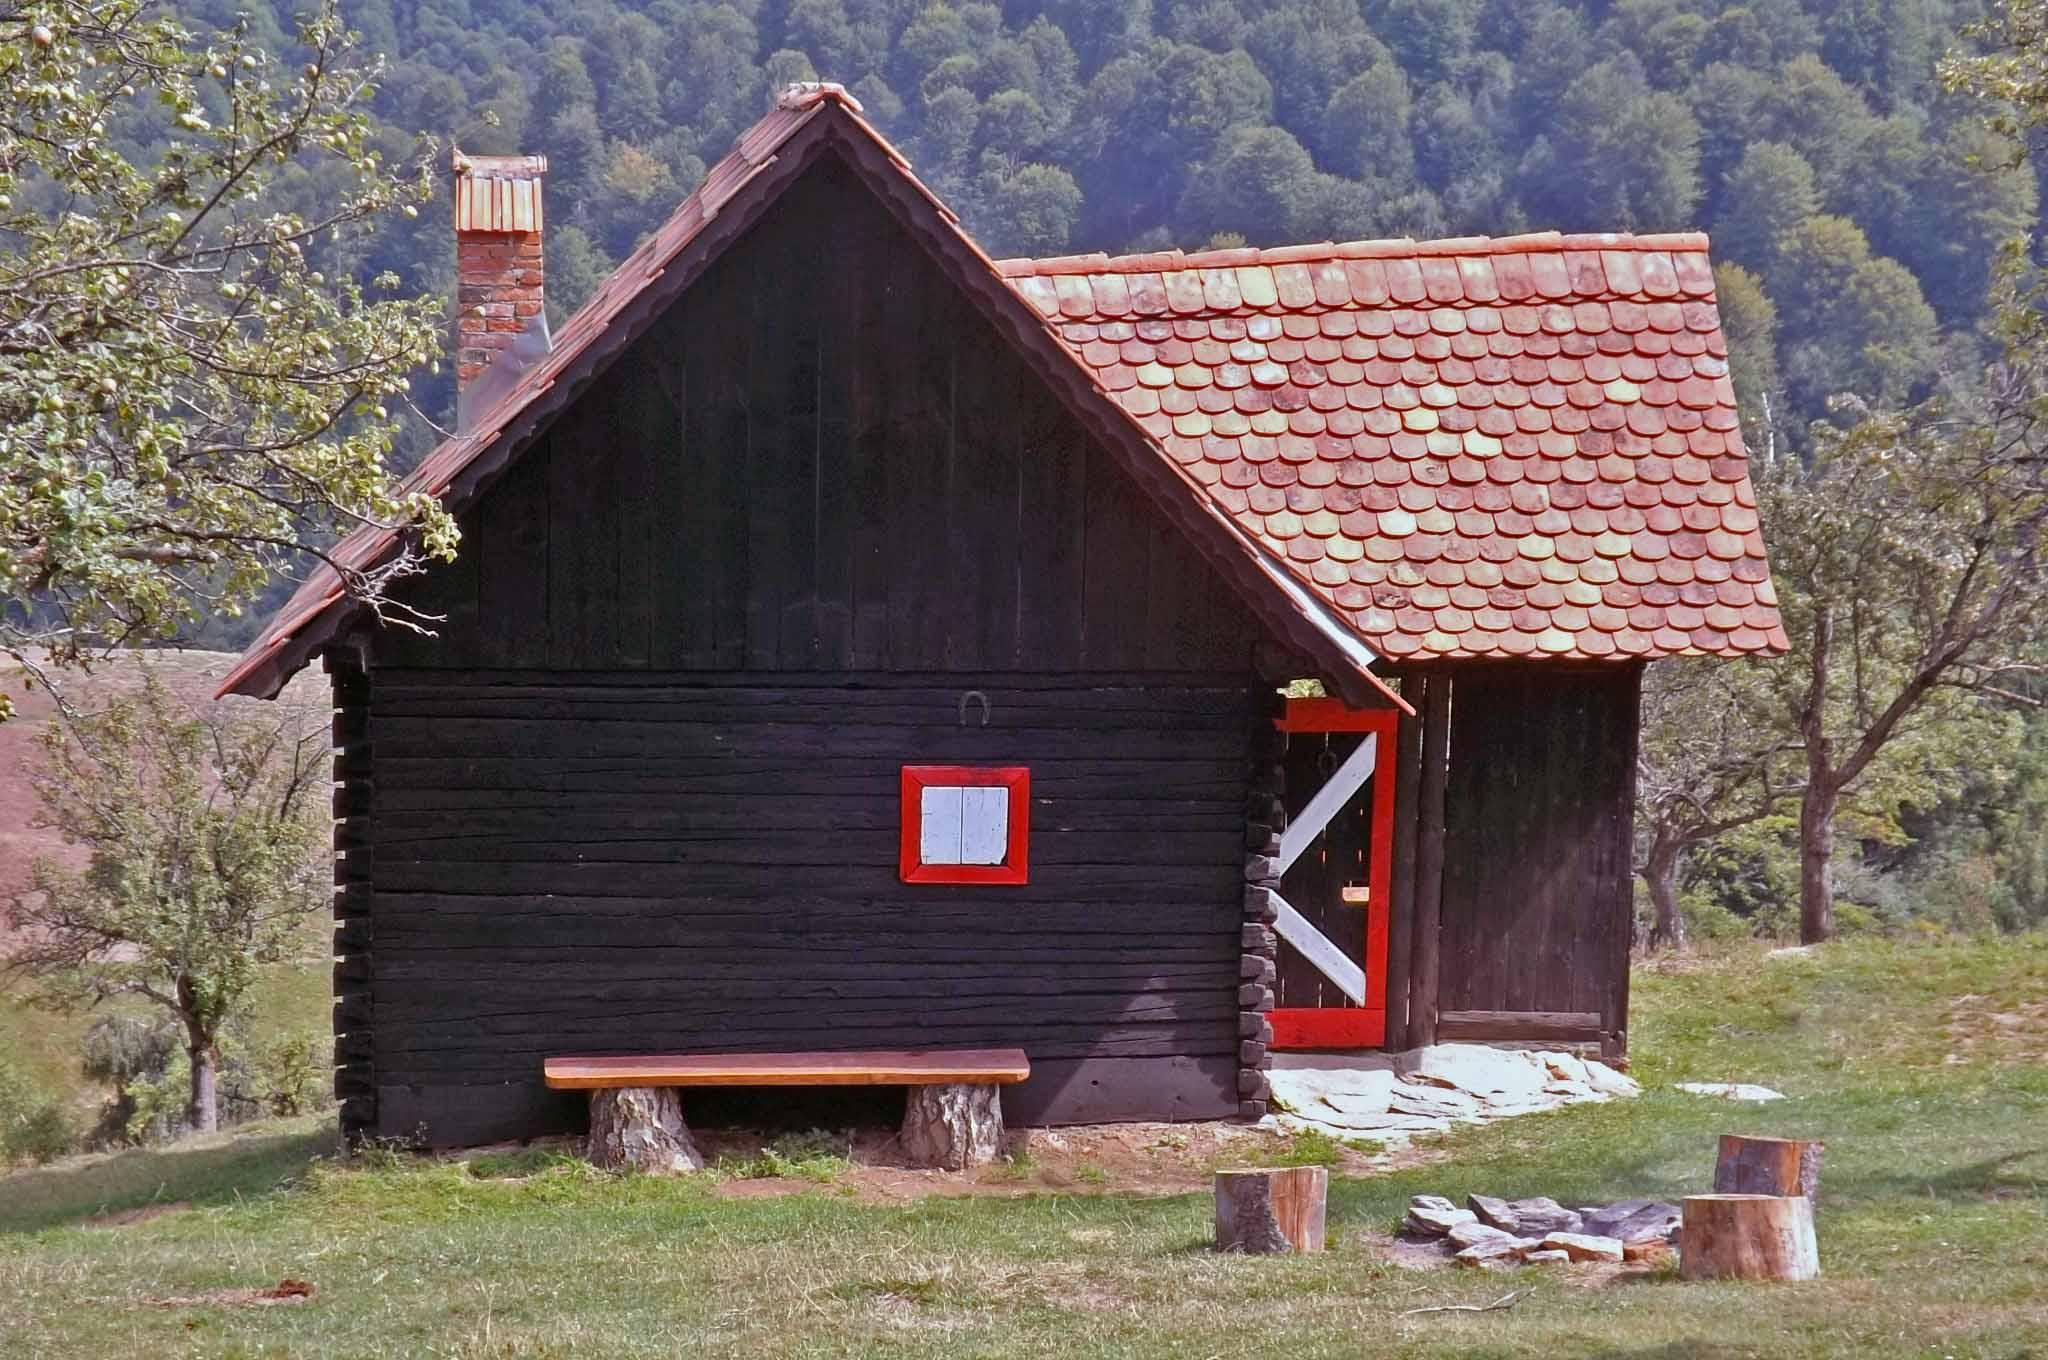 romania log homes transylvania, carpathian hut mountain refuge